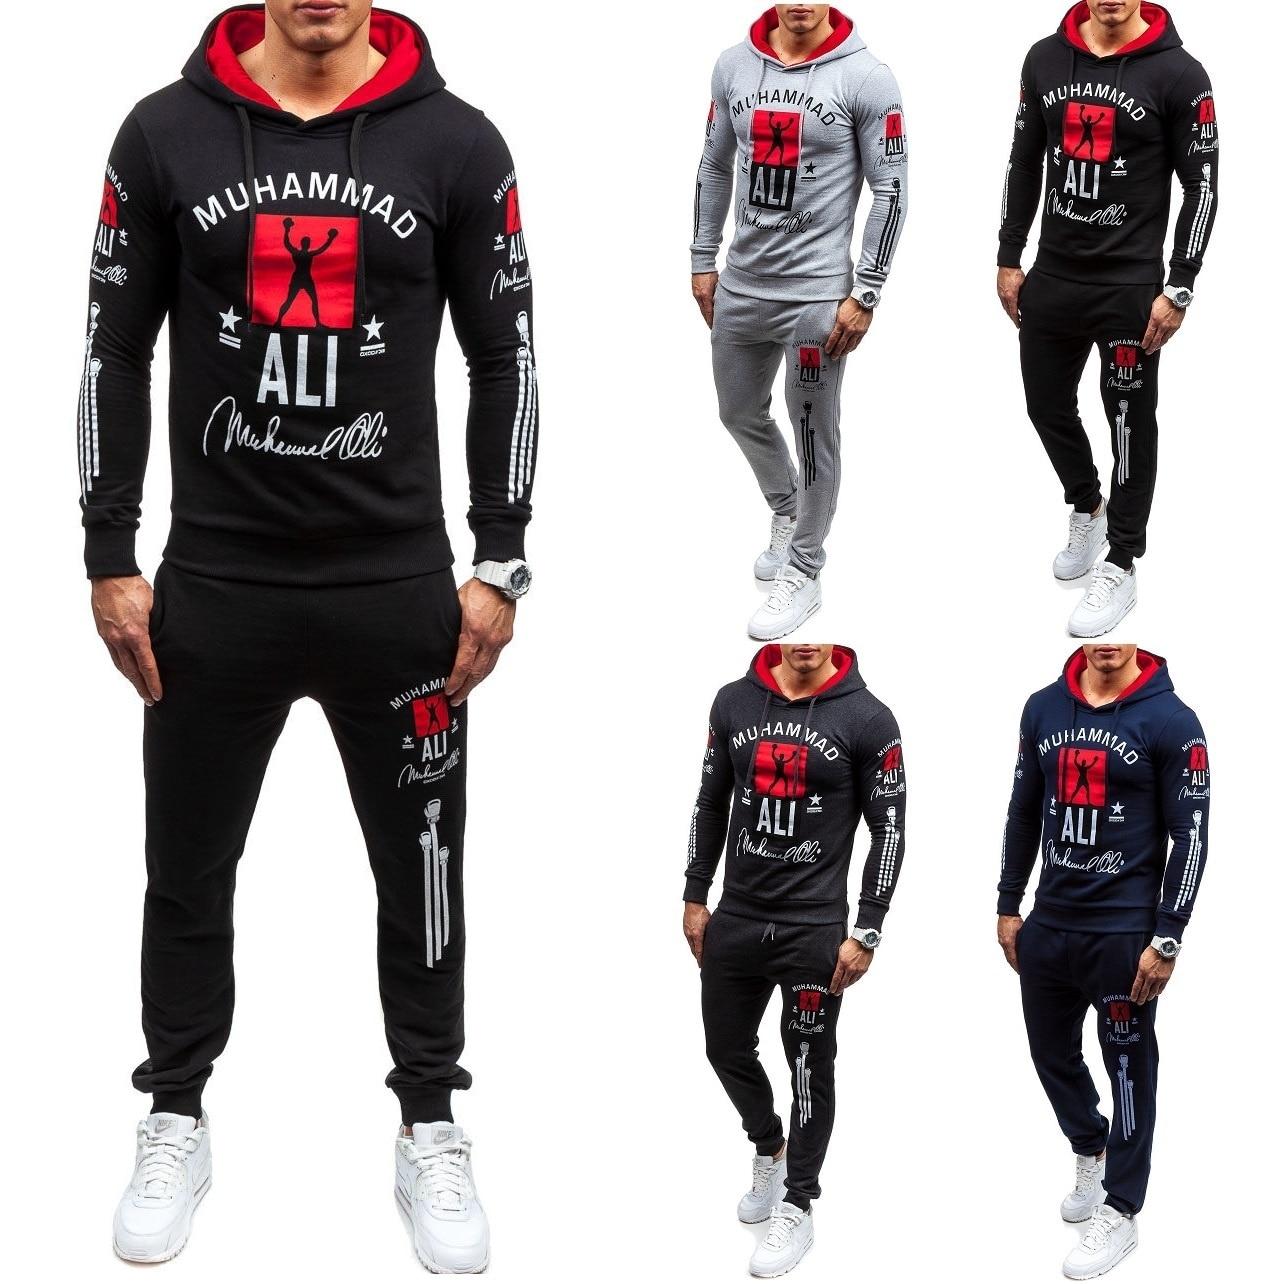 ZOGAA Men's Tracksuit Brand New Fashion 2 Parts Hooded Sweatshirt And Sport Pants Set Two Piece Set Sweatsuit Men Track Suit